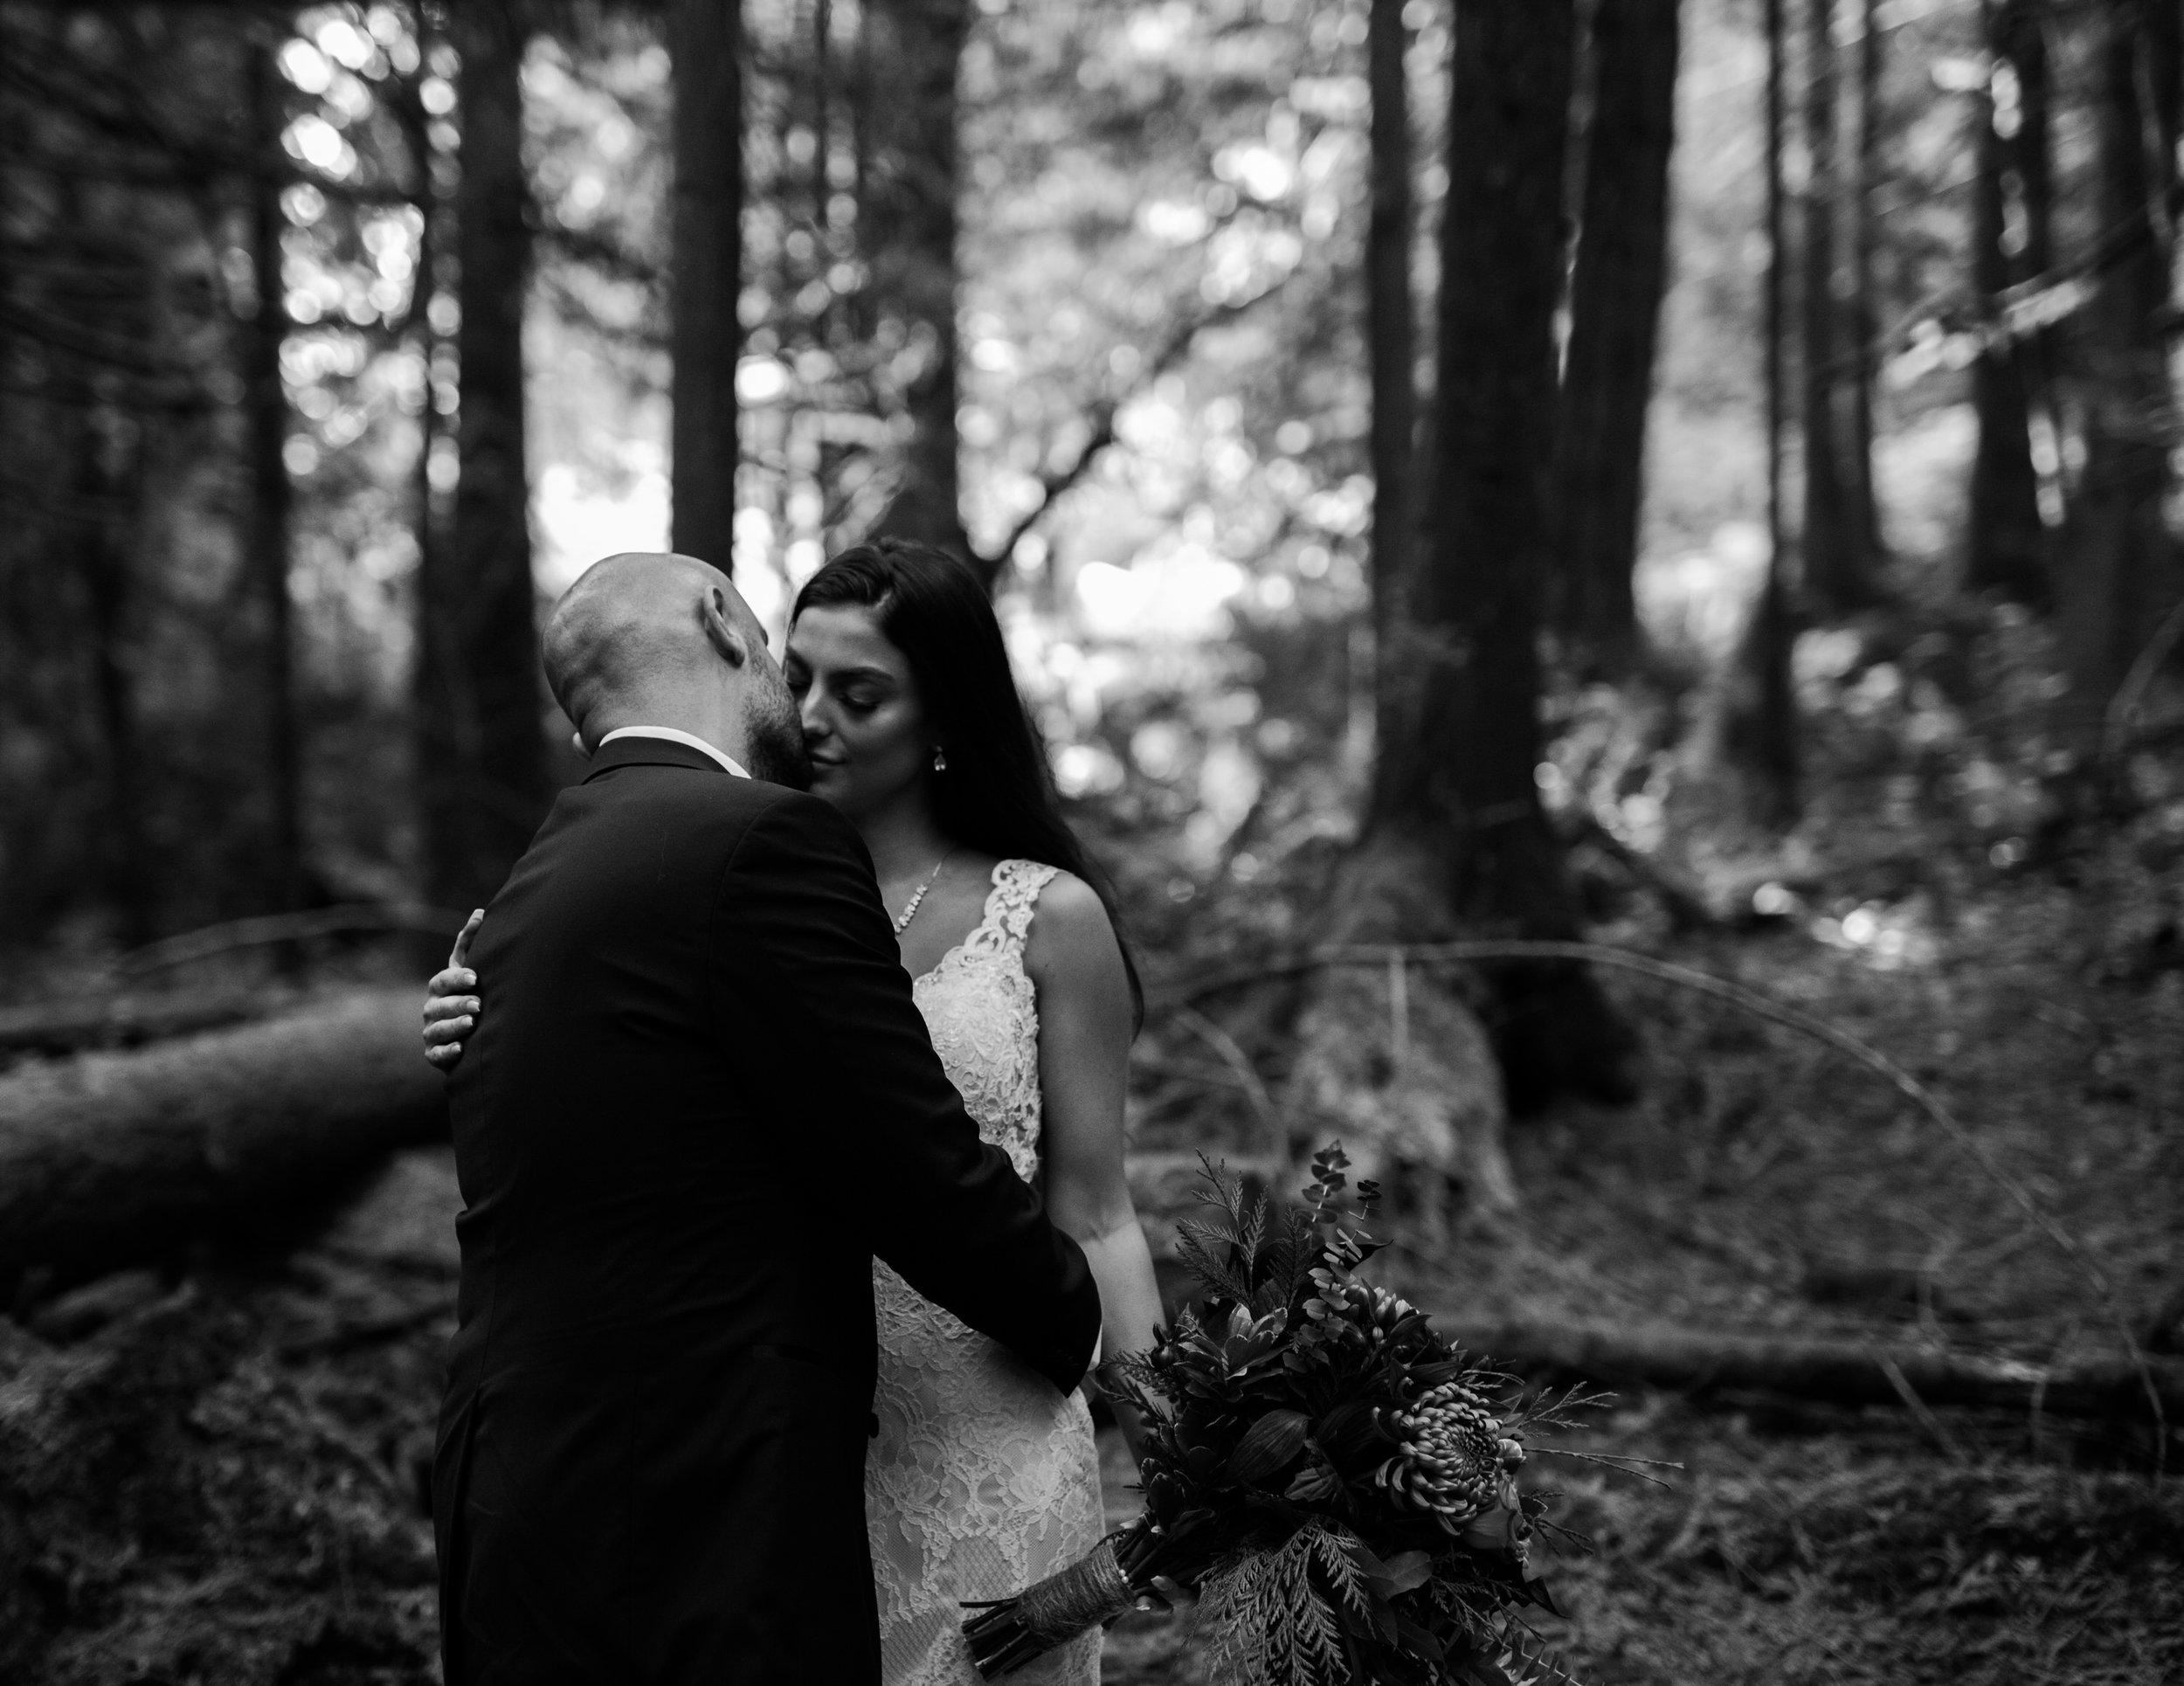 Day After Wedding Photos - Sunshine Coast Wedding Photos - Sunset Wedding Photos - Vancouver Wedding Photographer & Videographer - Sunshine Coast Wedding Photos - Sunshine Coast Wedding Photographer - Jennifer Picard Photography - 1A5A8293.jpg